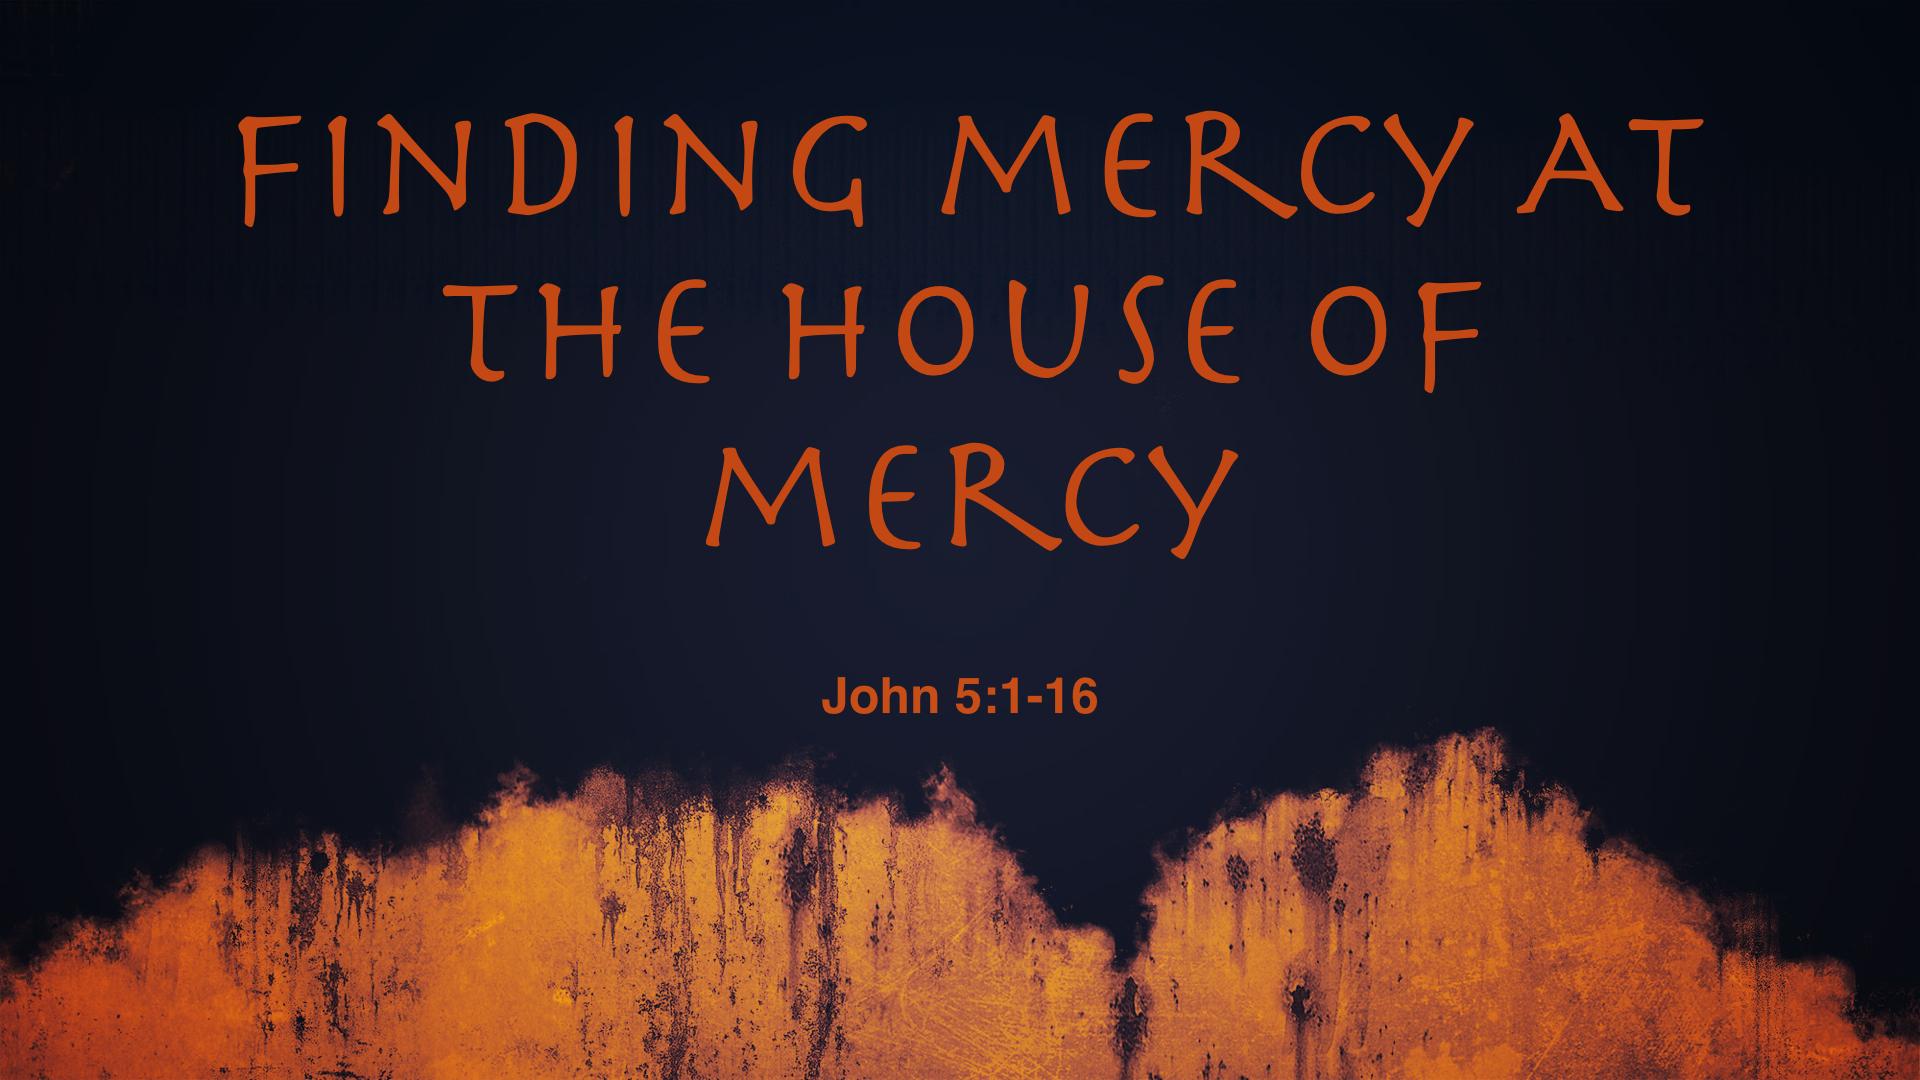 Finding Mercy Photo.jpg.001